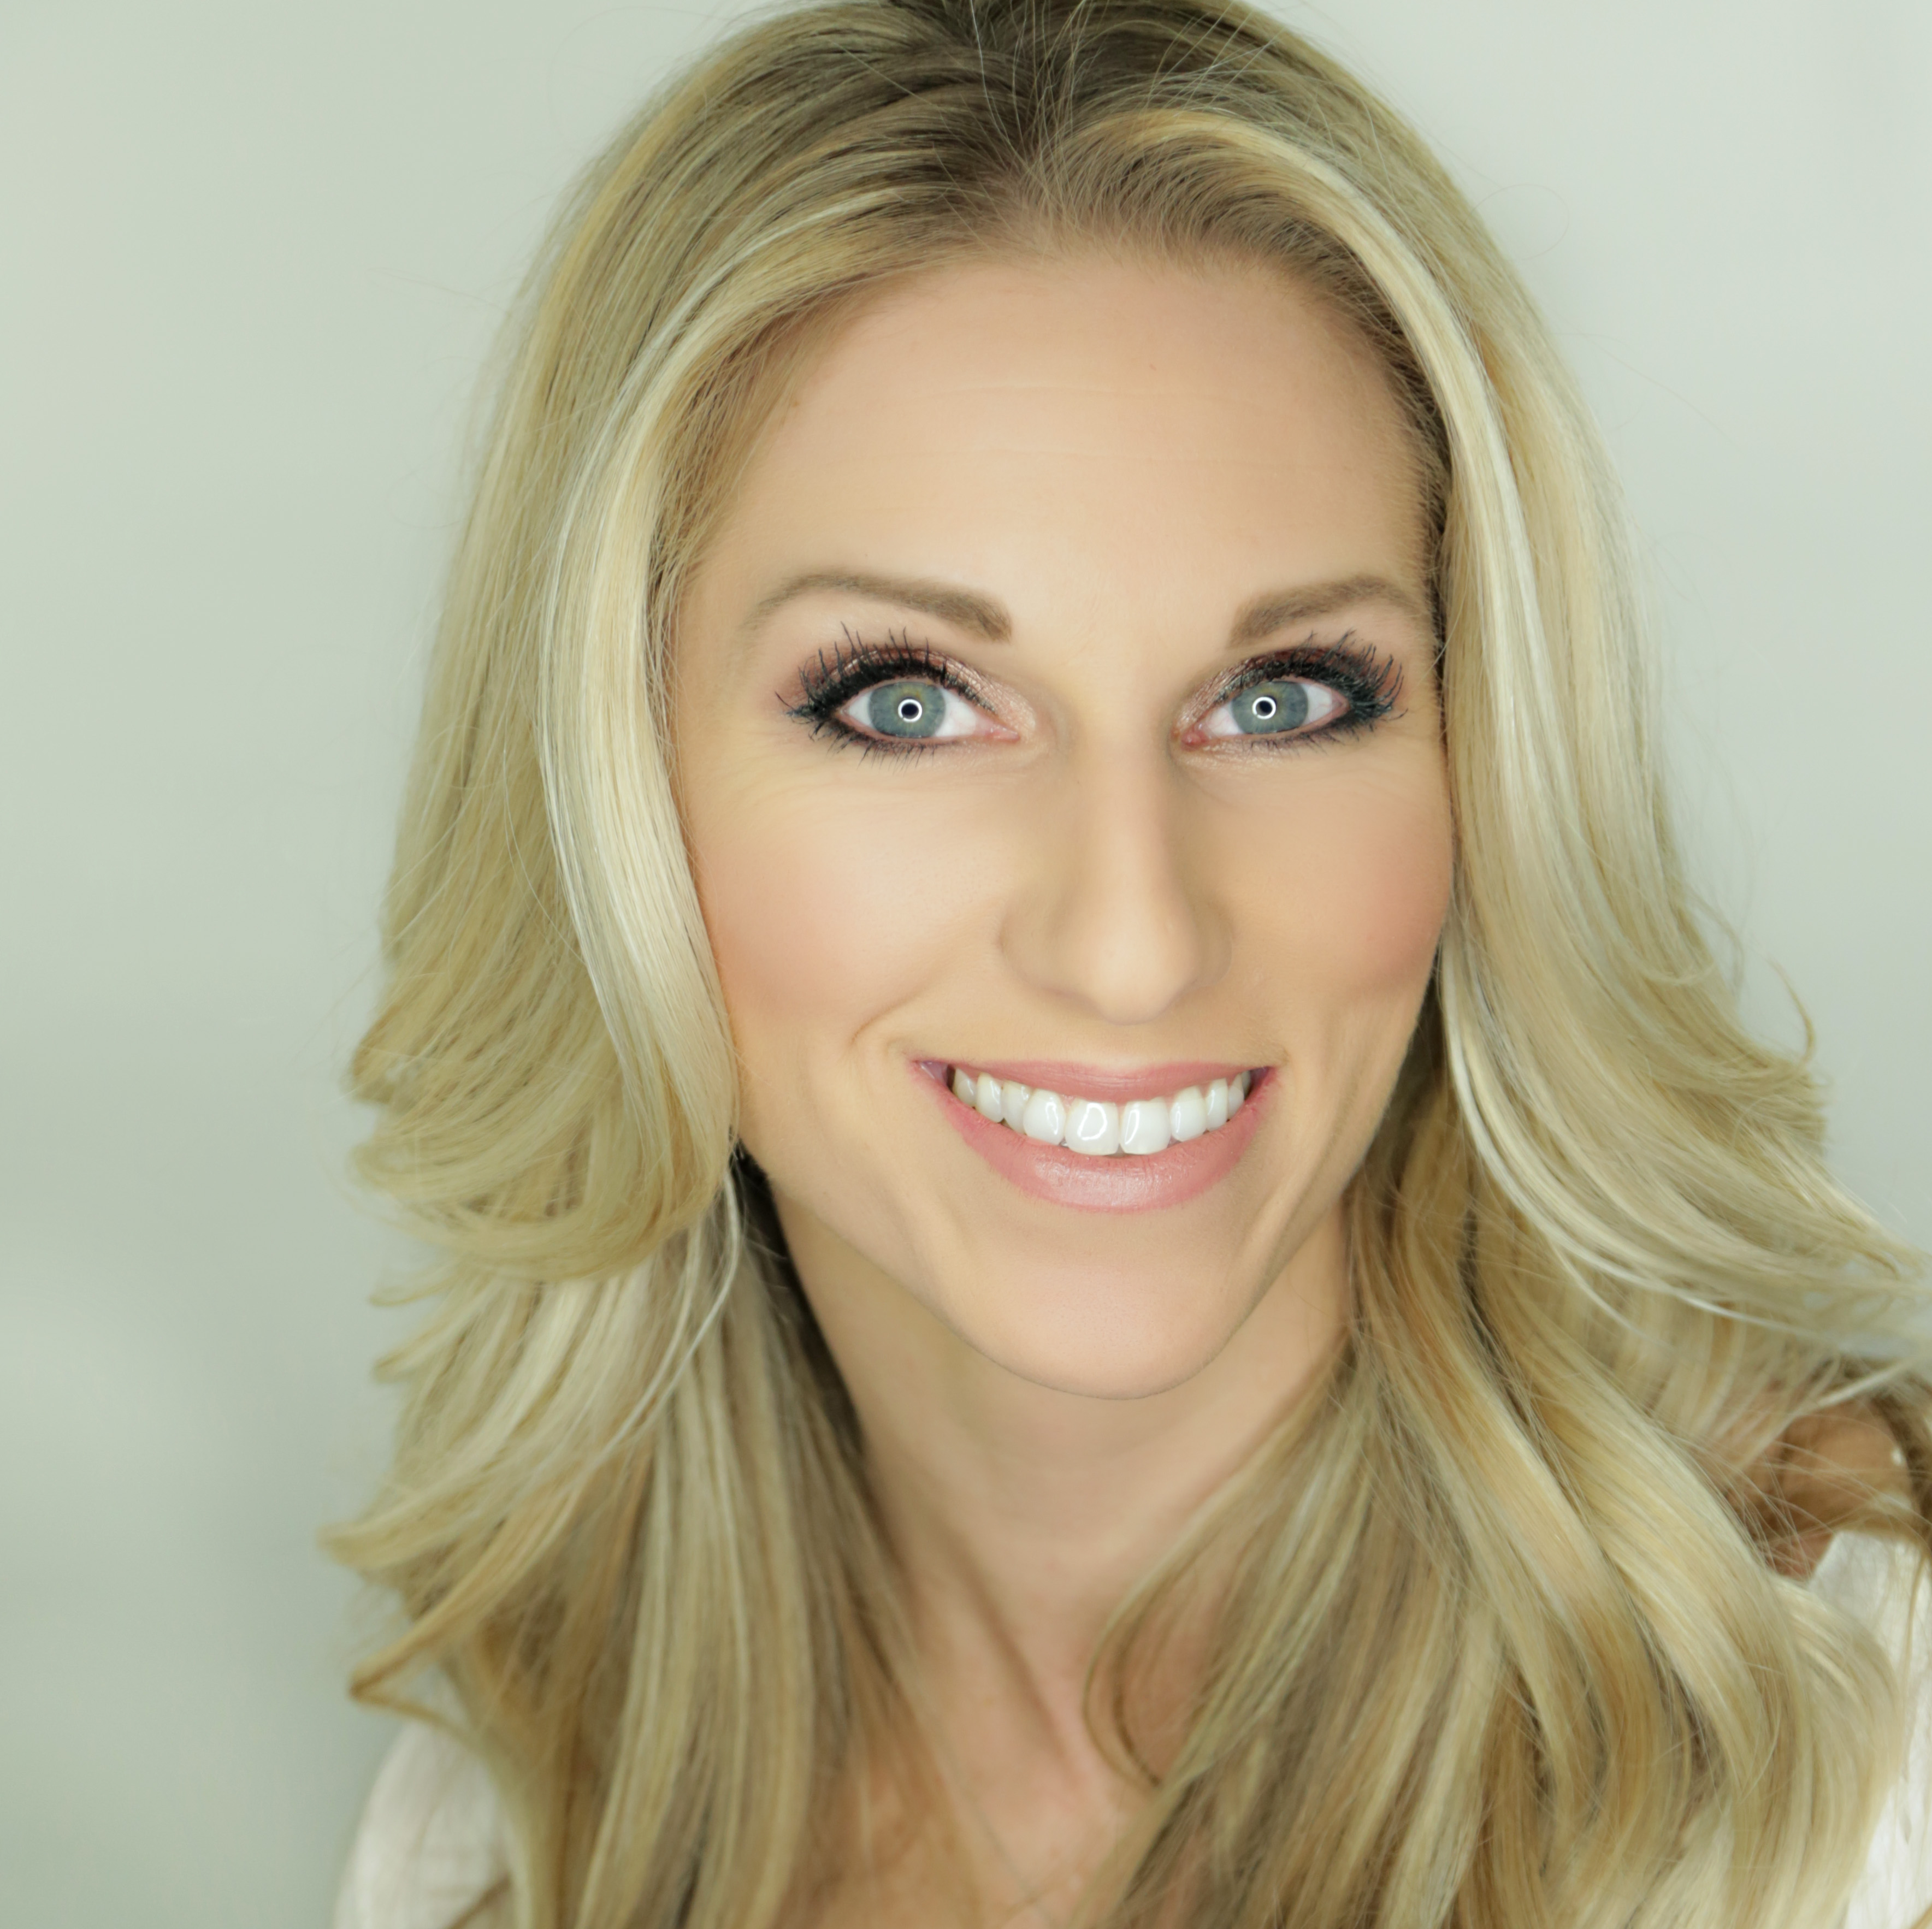 Shannon Hauhe